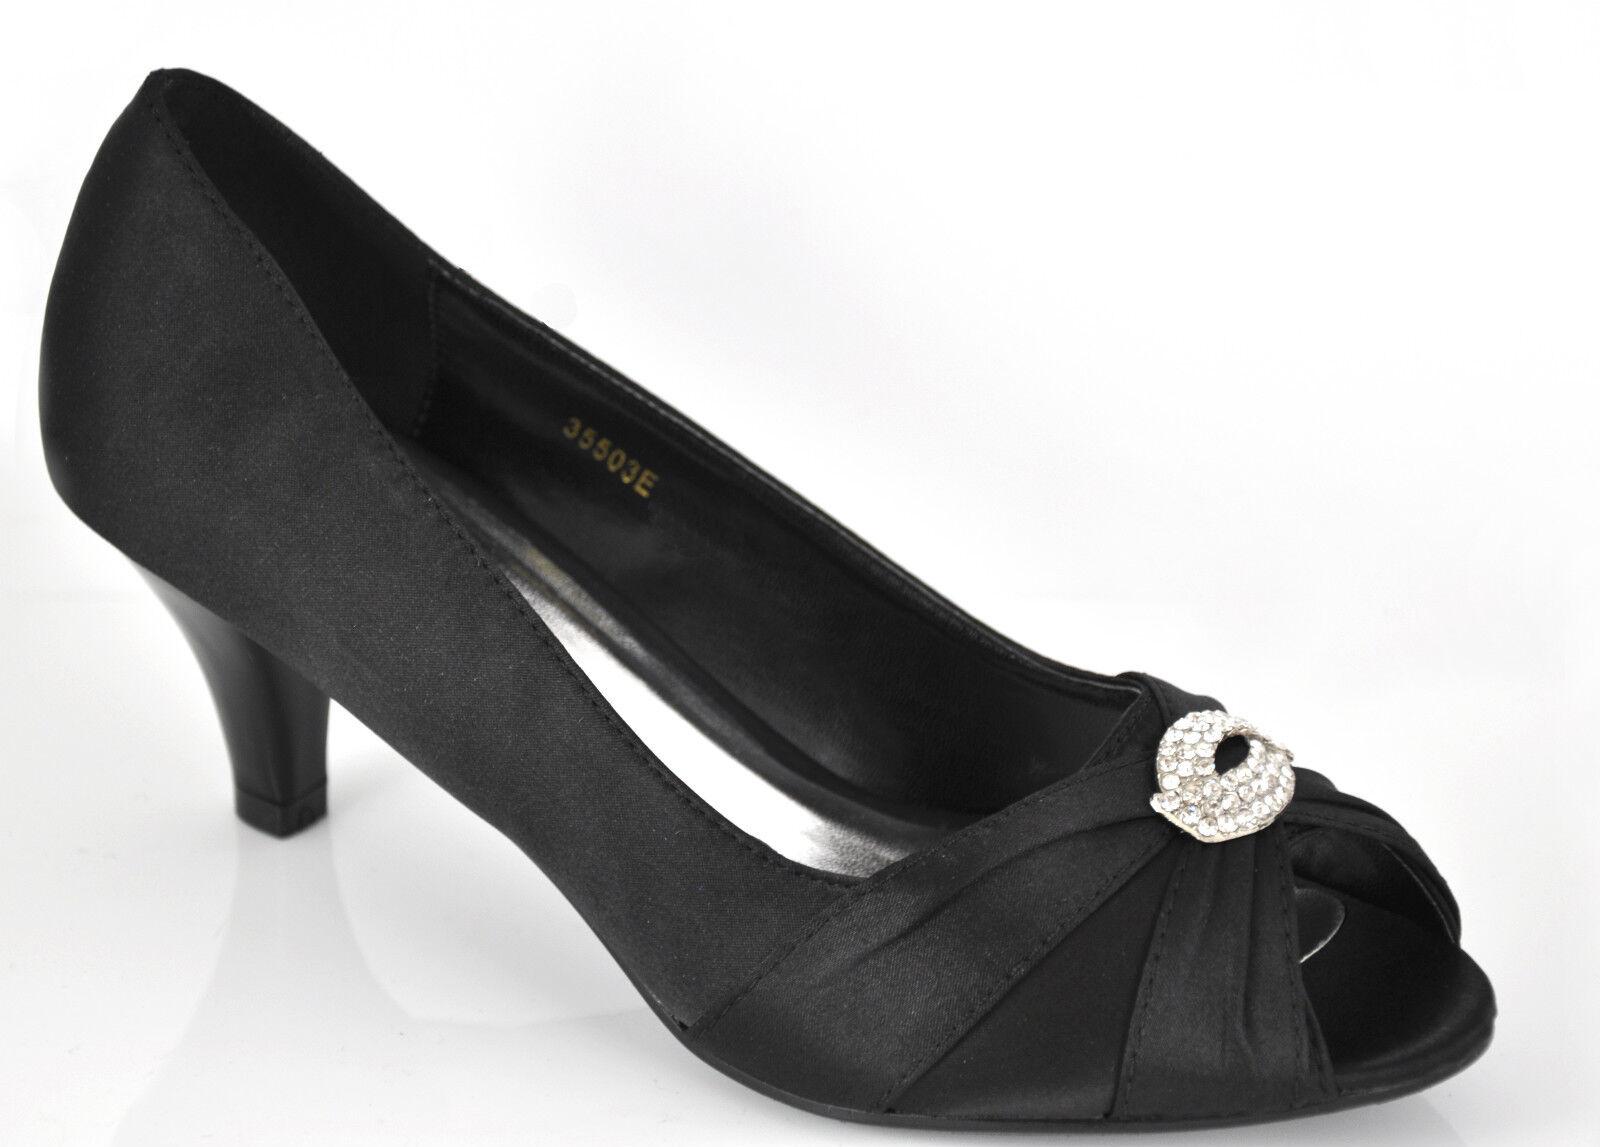 Satin Black Diamante Mid Heel Wedding Bridal Prom Shoes UK 3 4 5 6 7 7.5